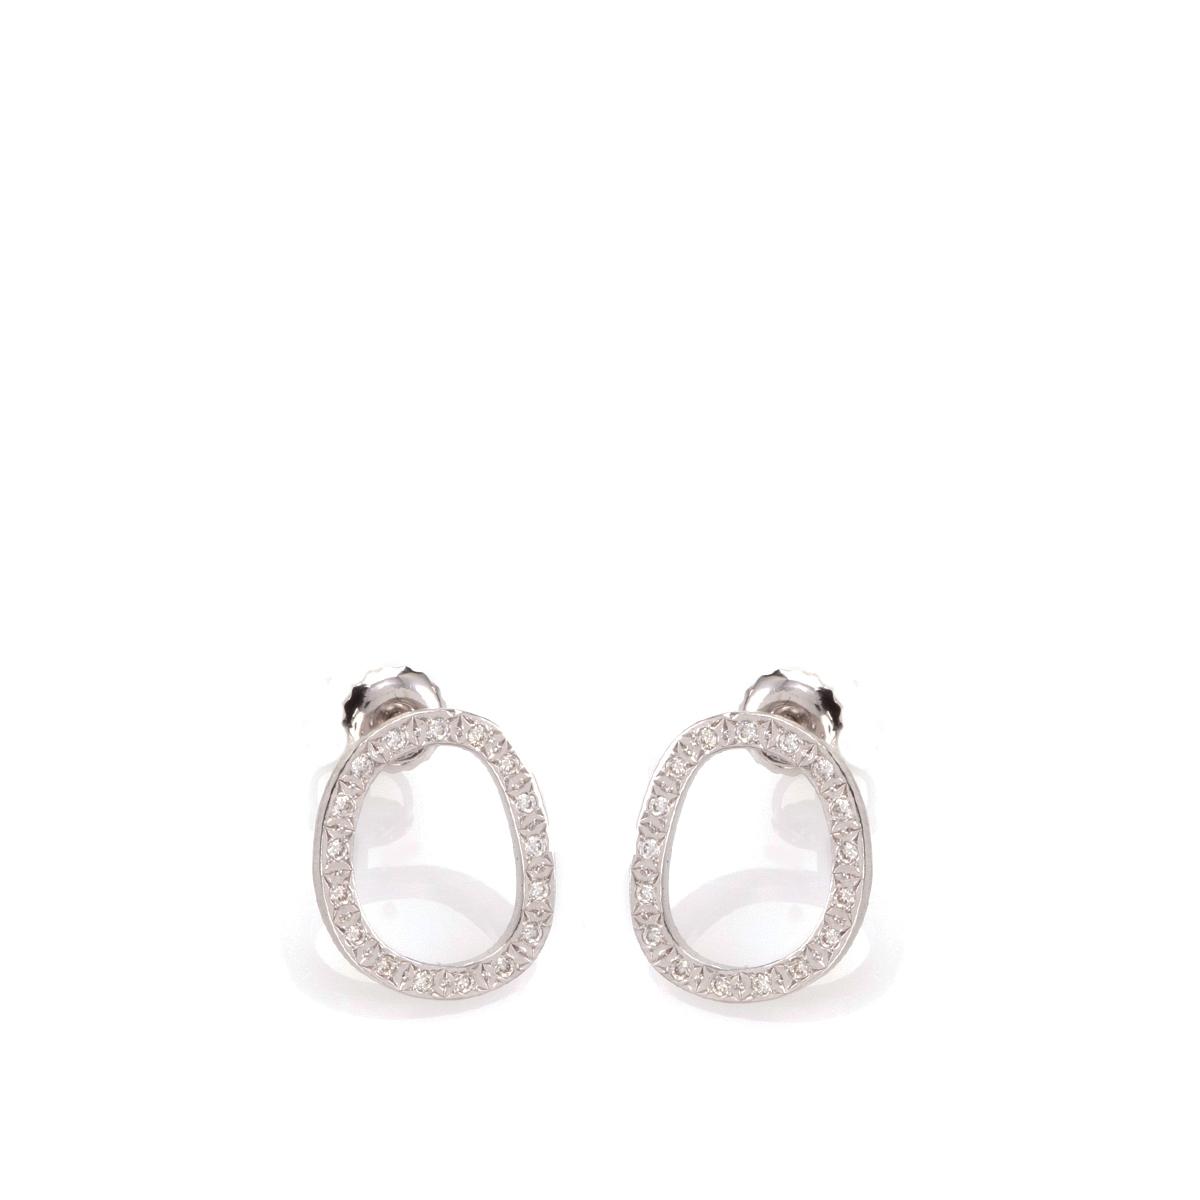 Asymmetric stud gold and Diamonds earrings